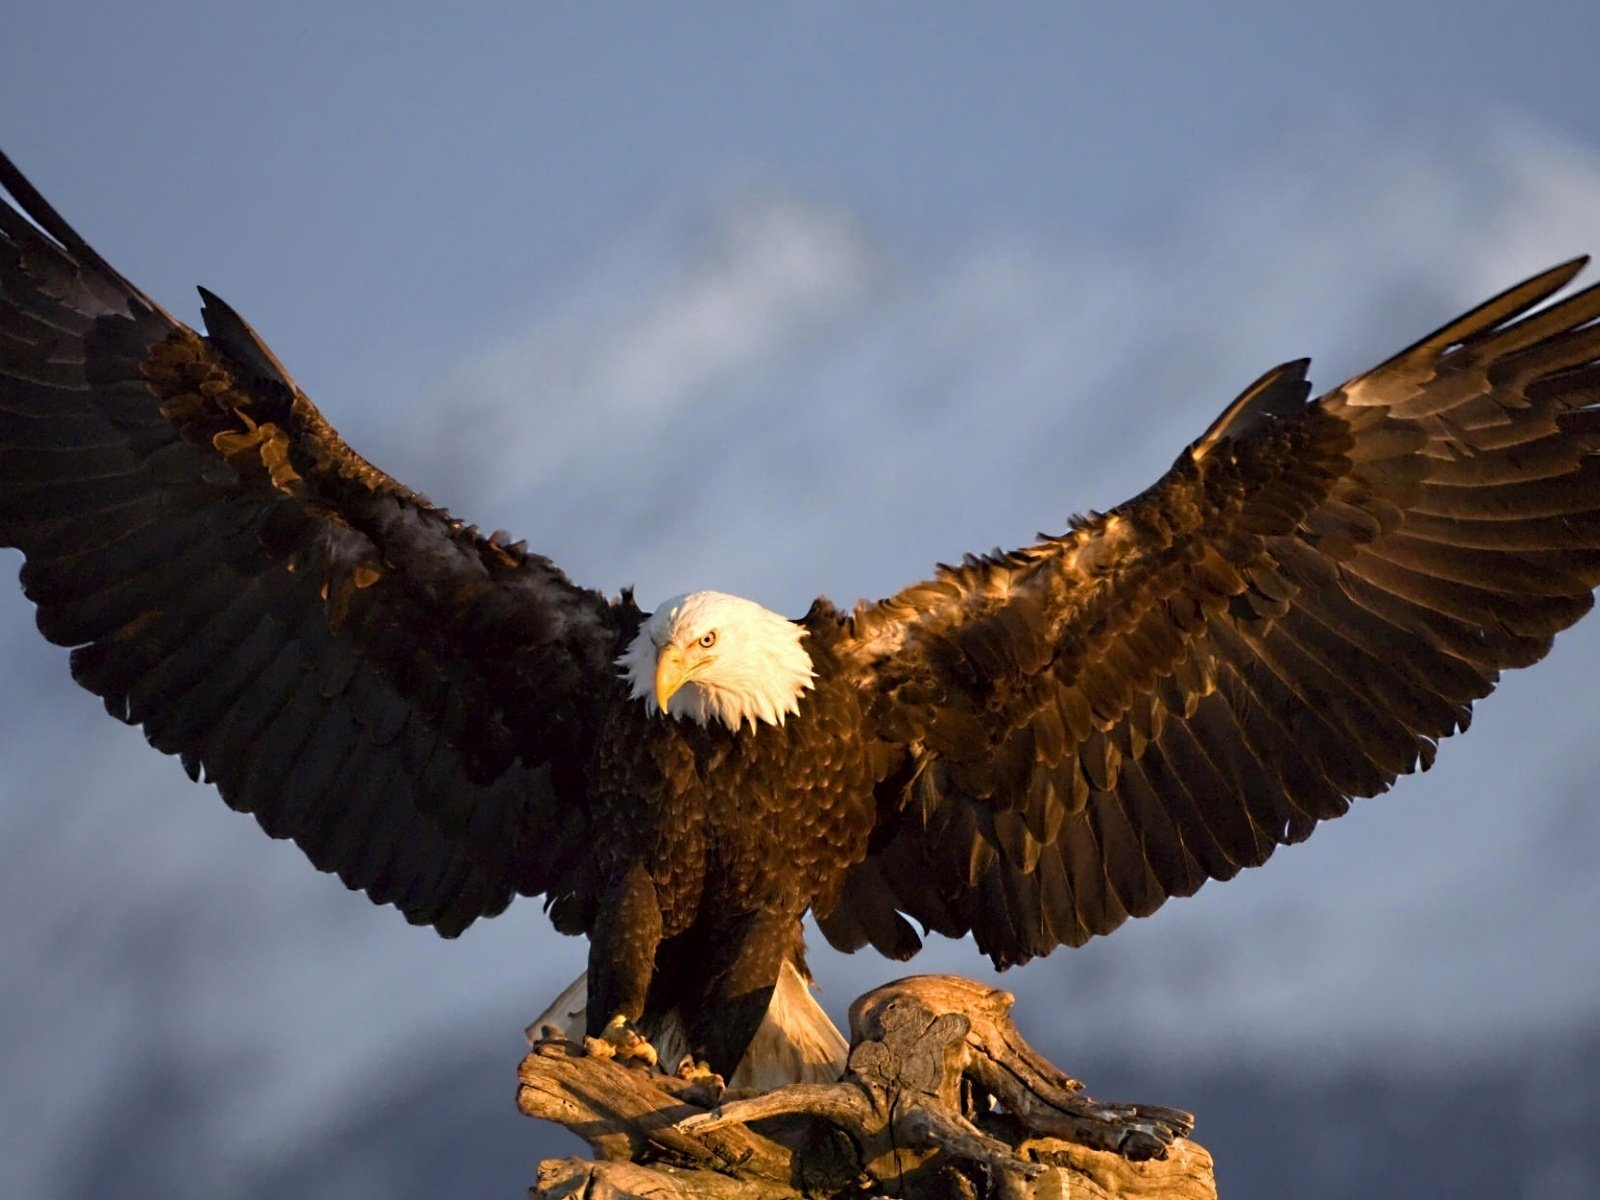 фото орла на телефон крыша